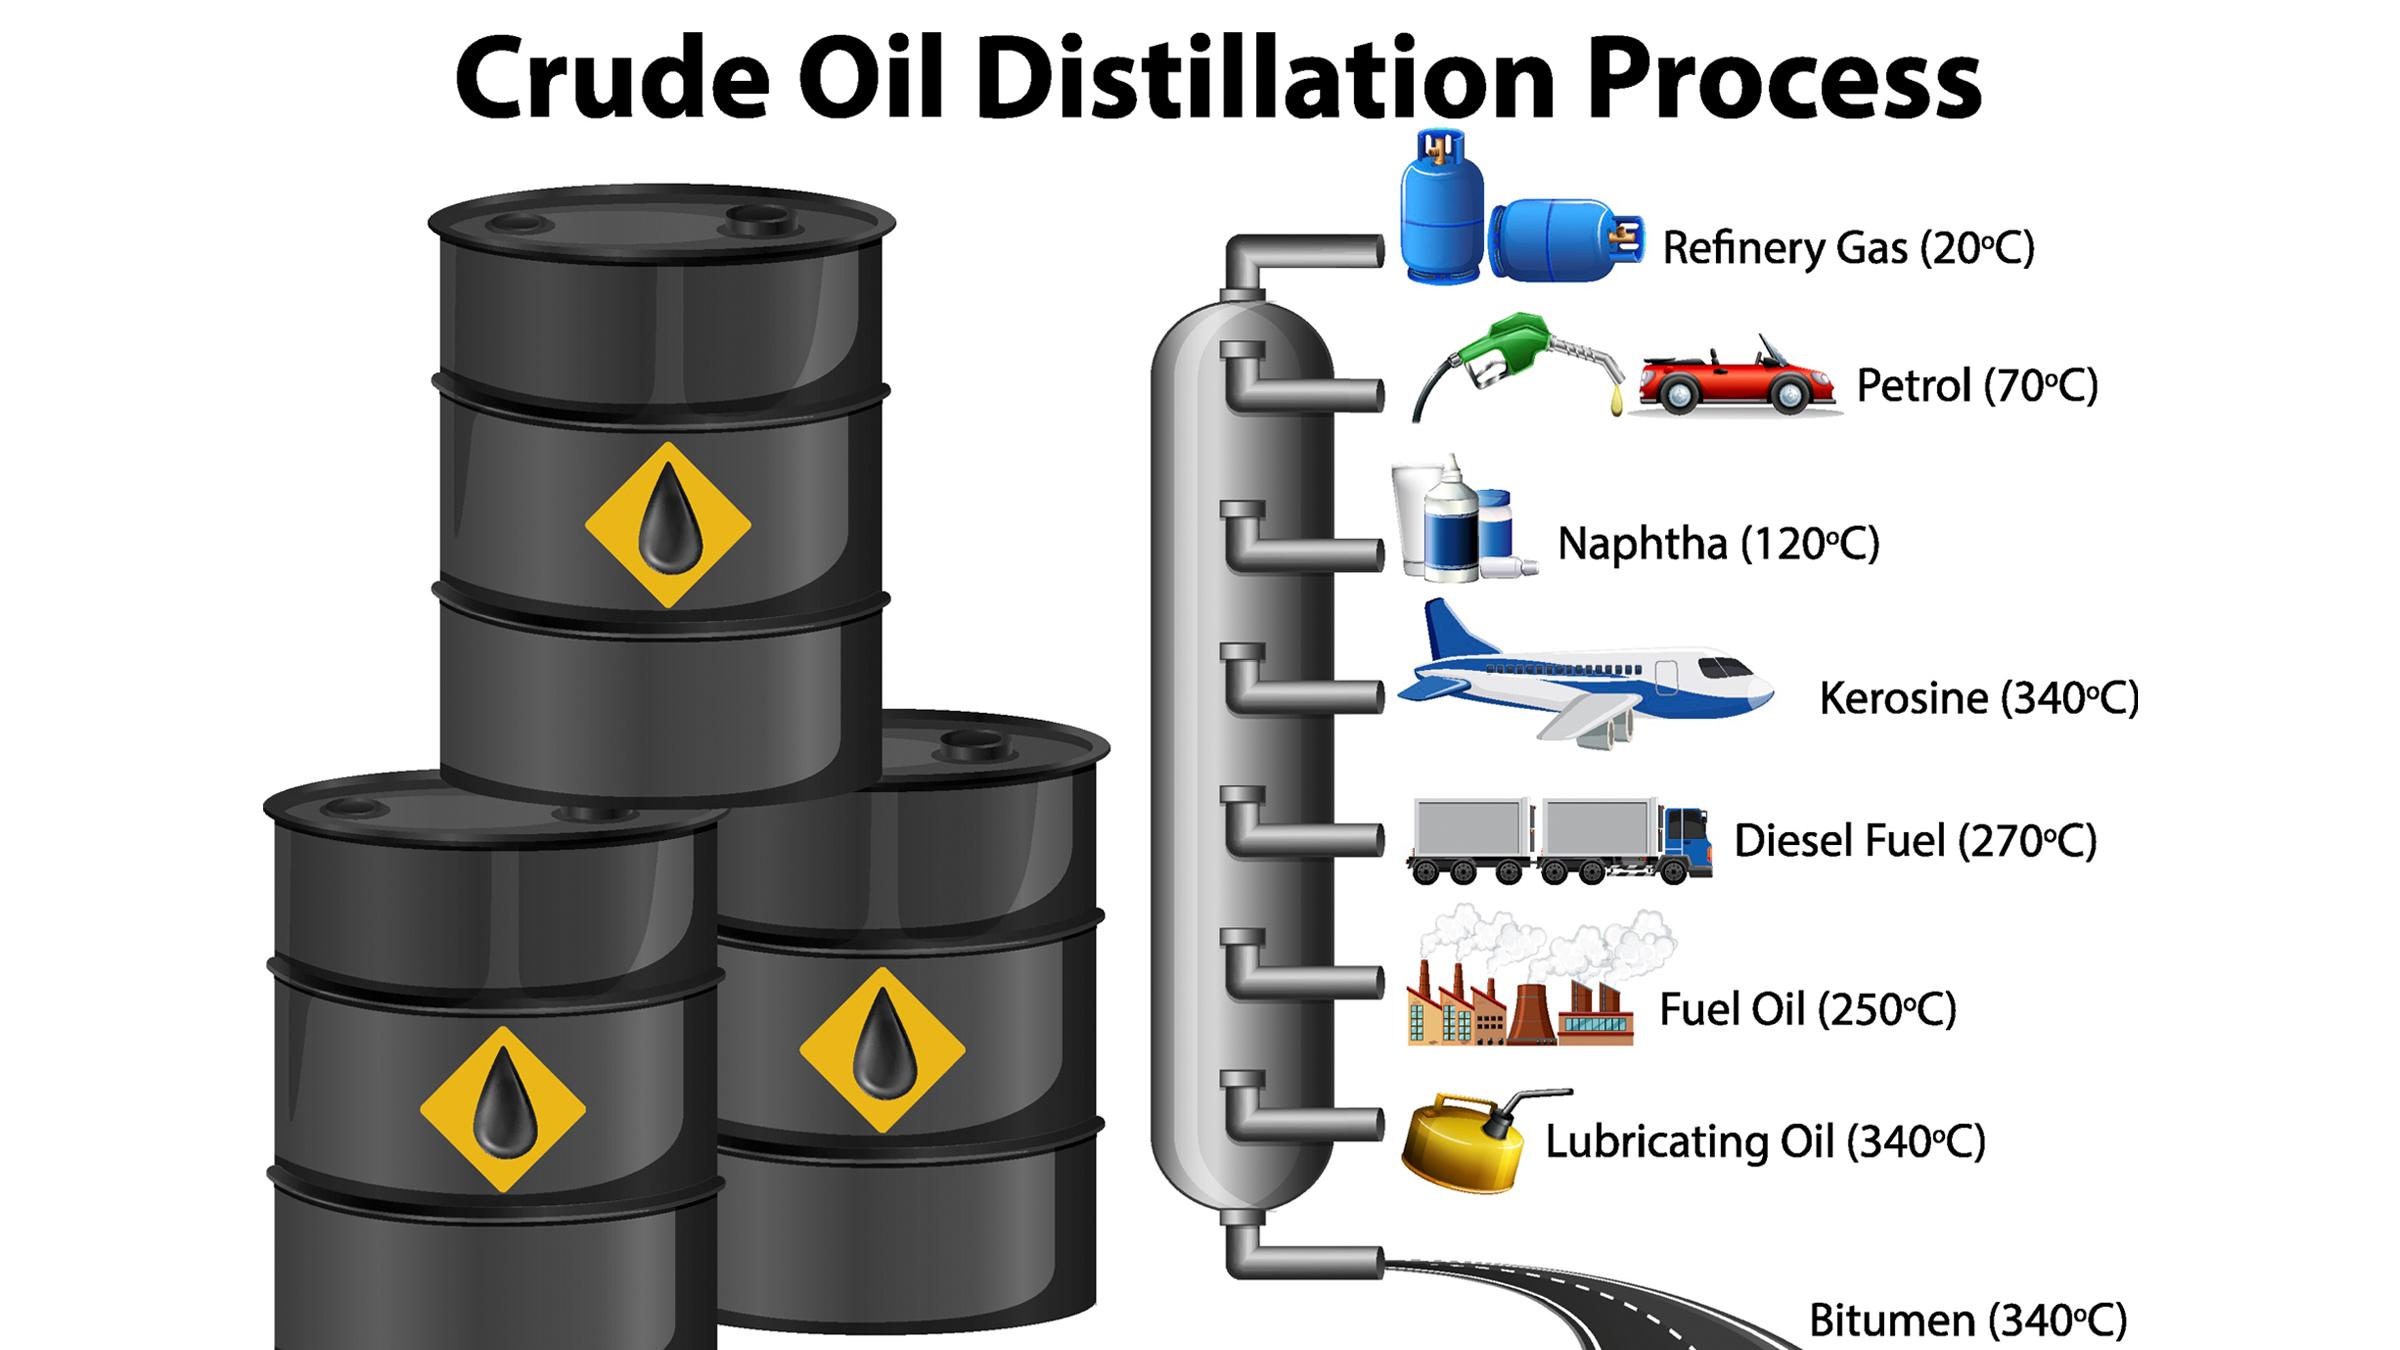 diagram showing crude oil distillation process